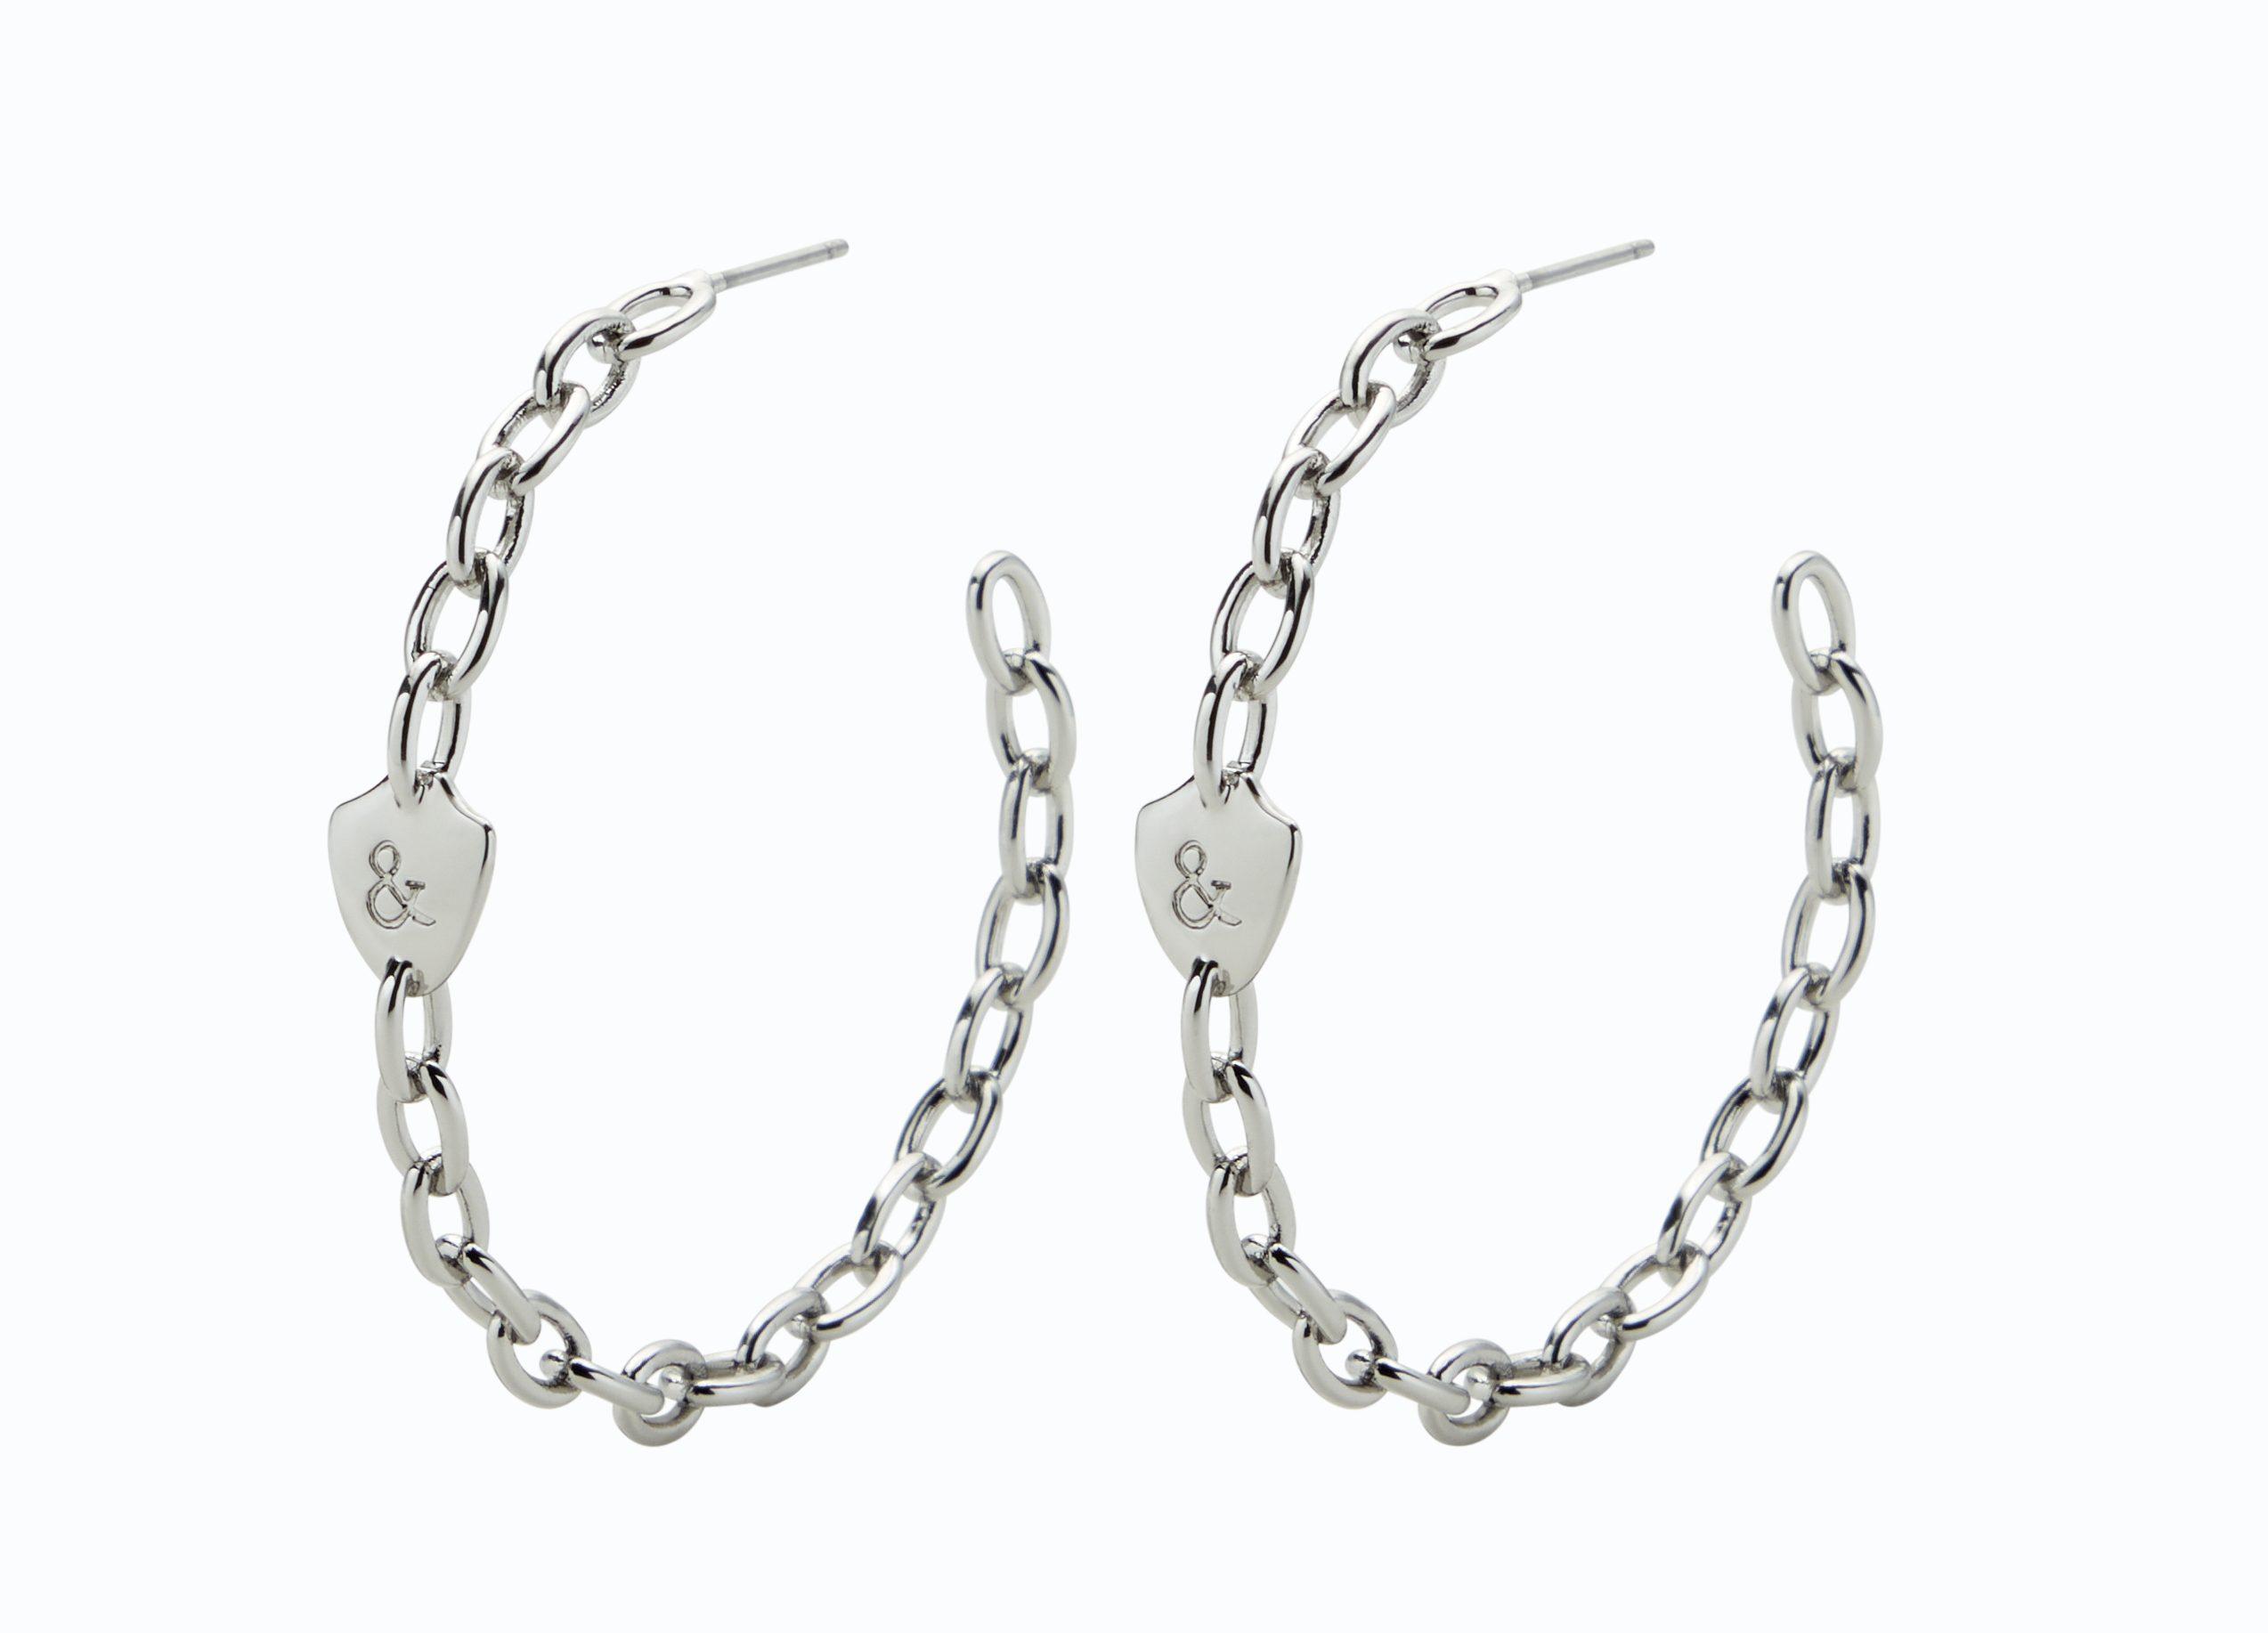 Photos from Loren Gray's &always Jewelry Brand